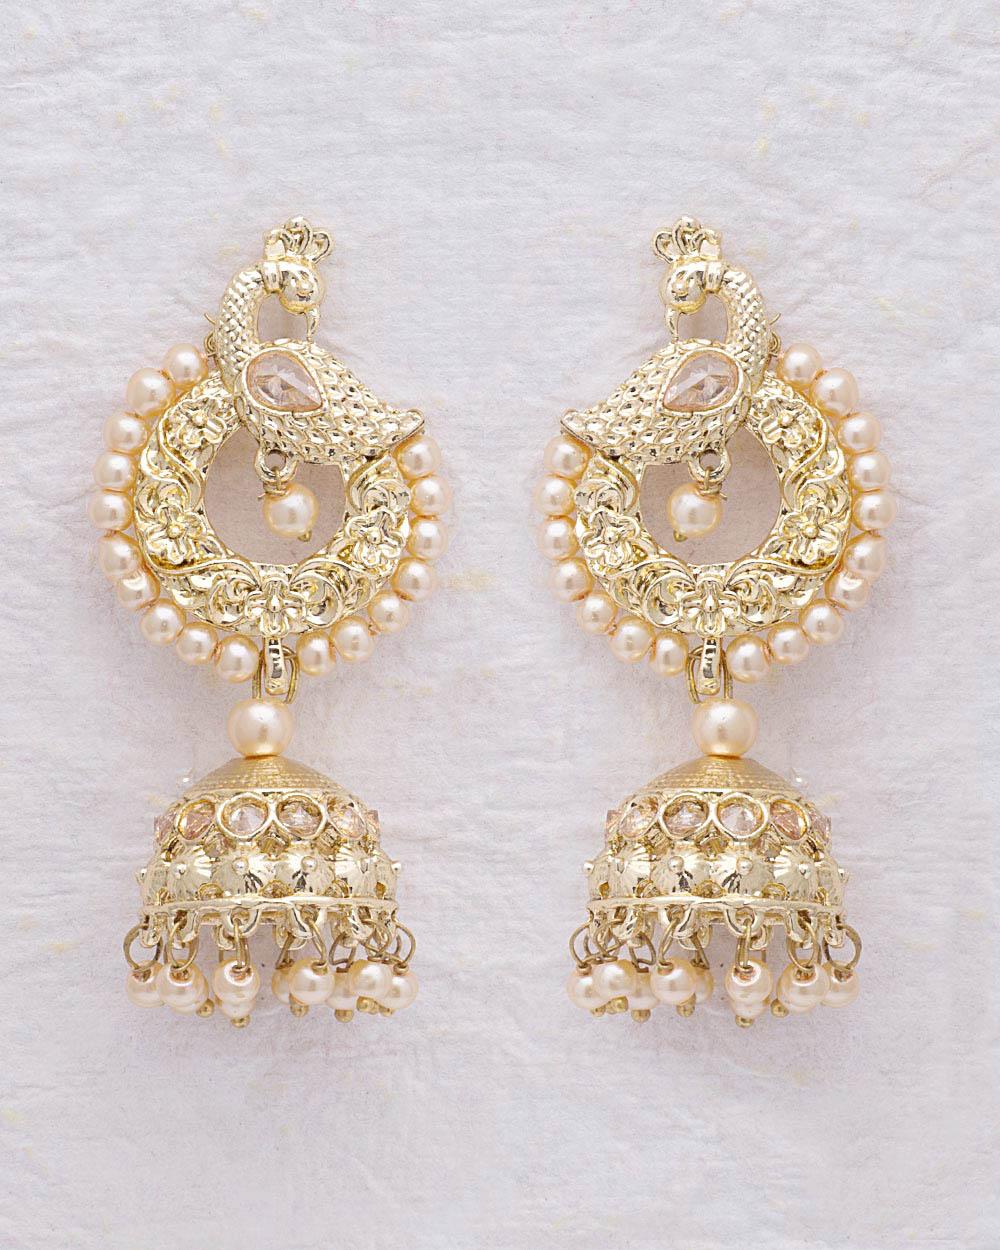 Buy Peacock Motif Gold Plated Jhumka Earrings Online India | Voylla